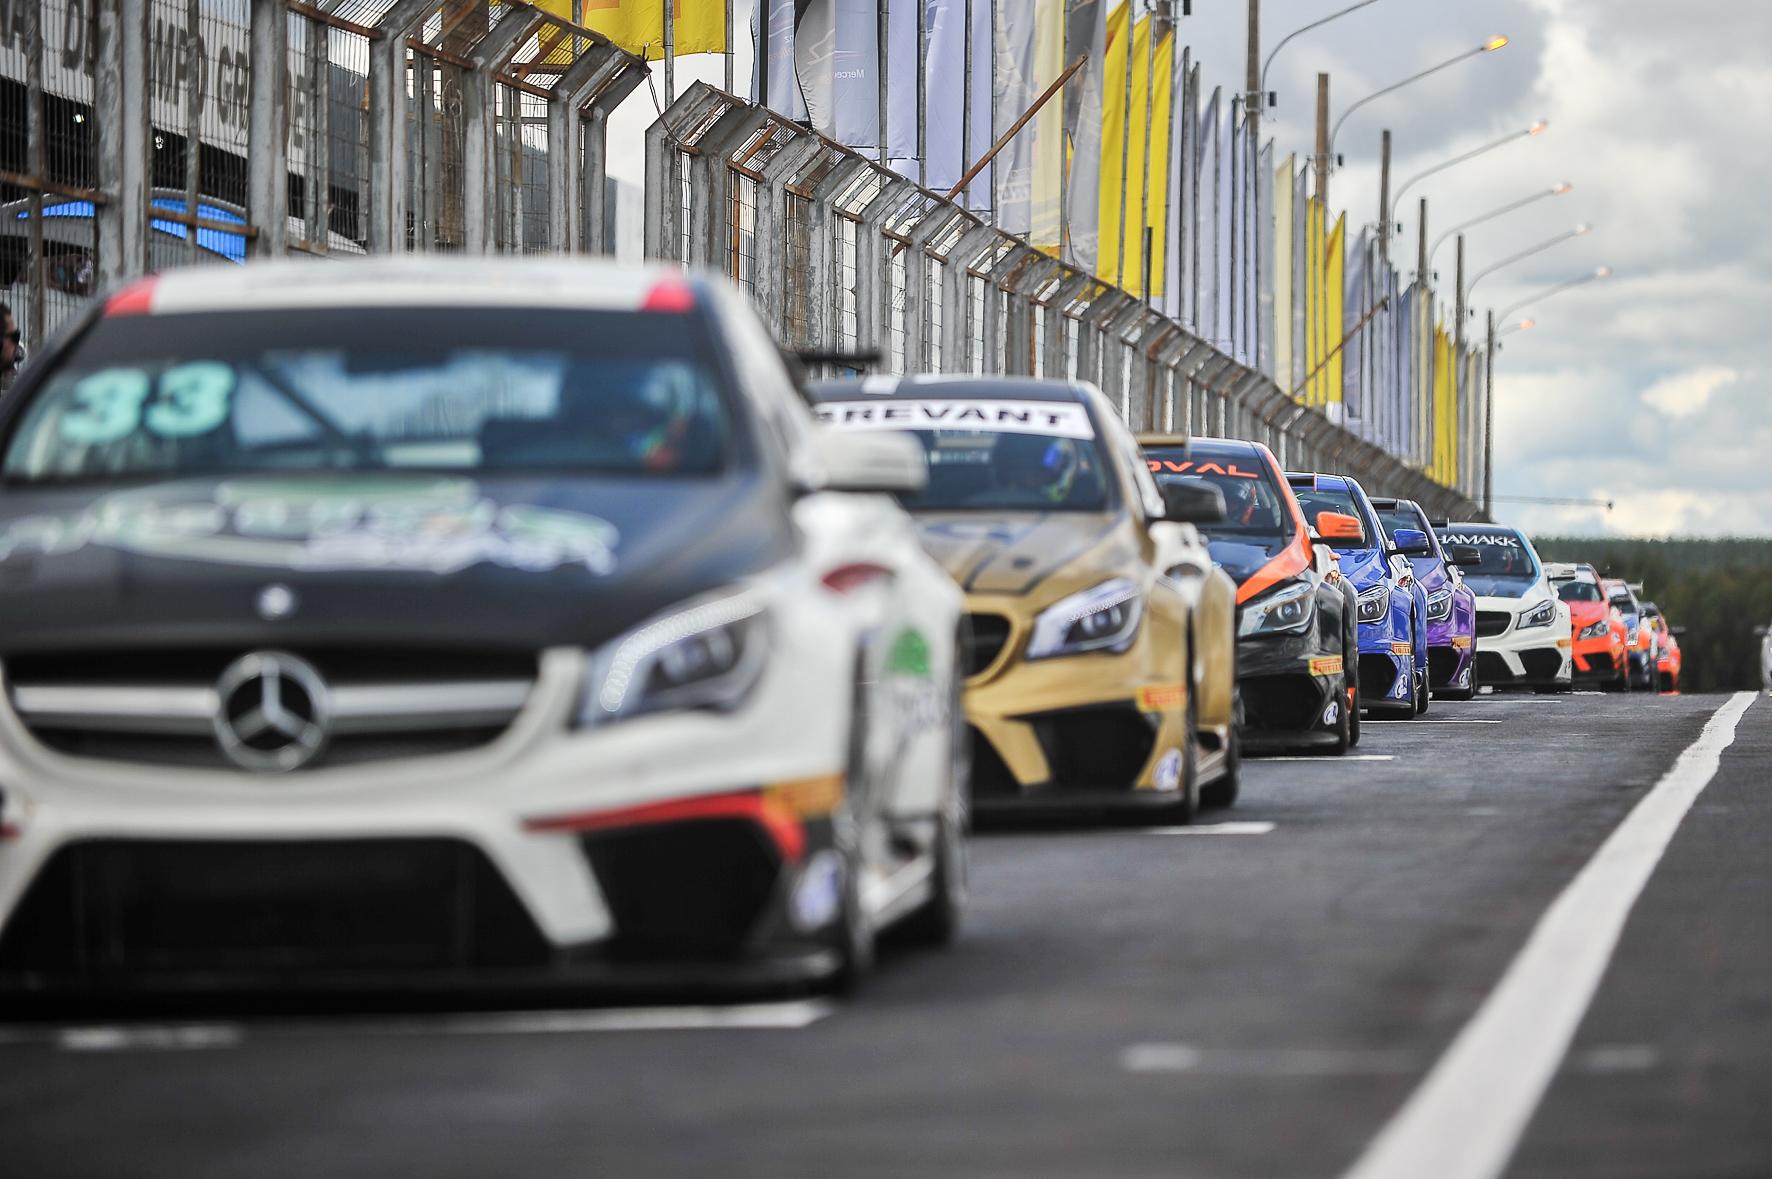 Photo of MB Challenge – Mercedes-Benz Challenge chega a Curvelo com empate na liderança do campeonato